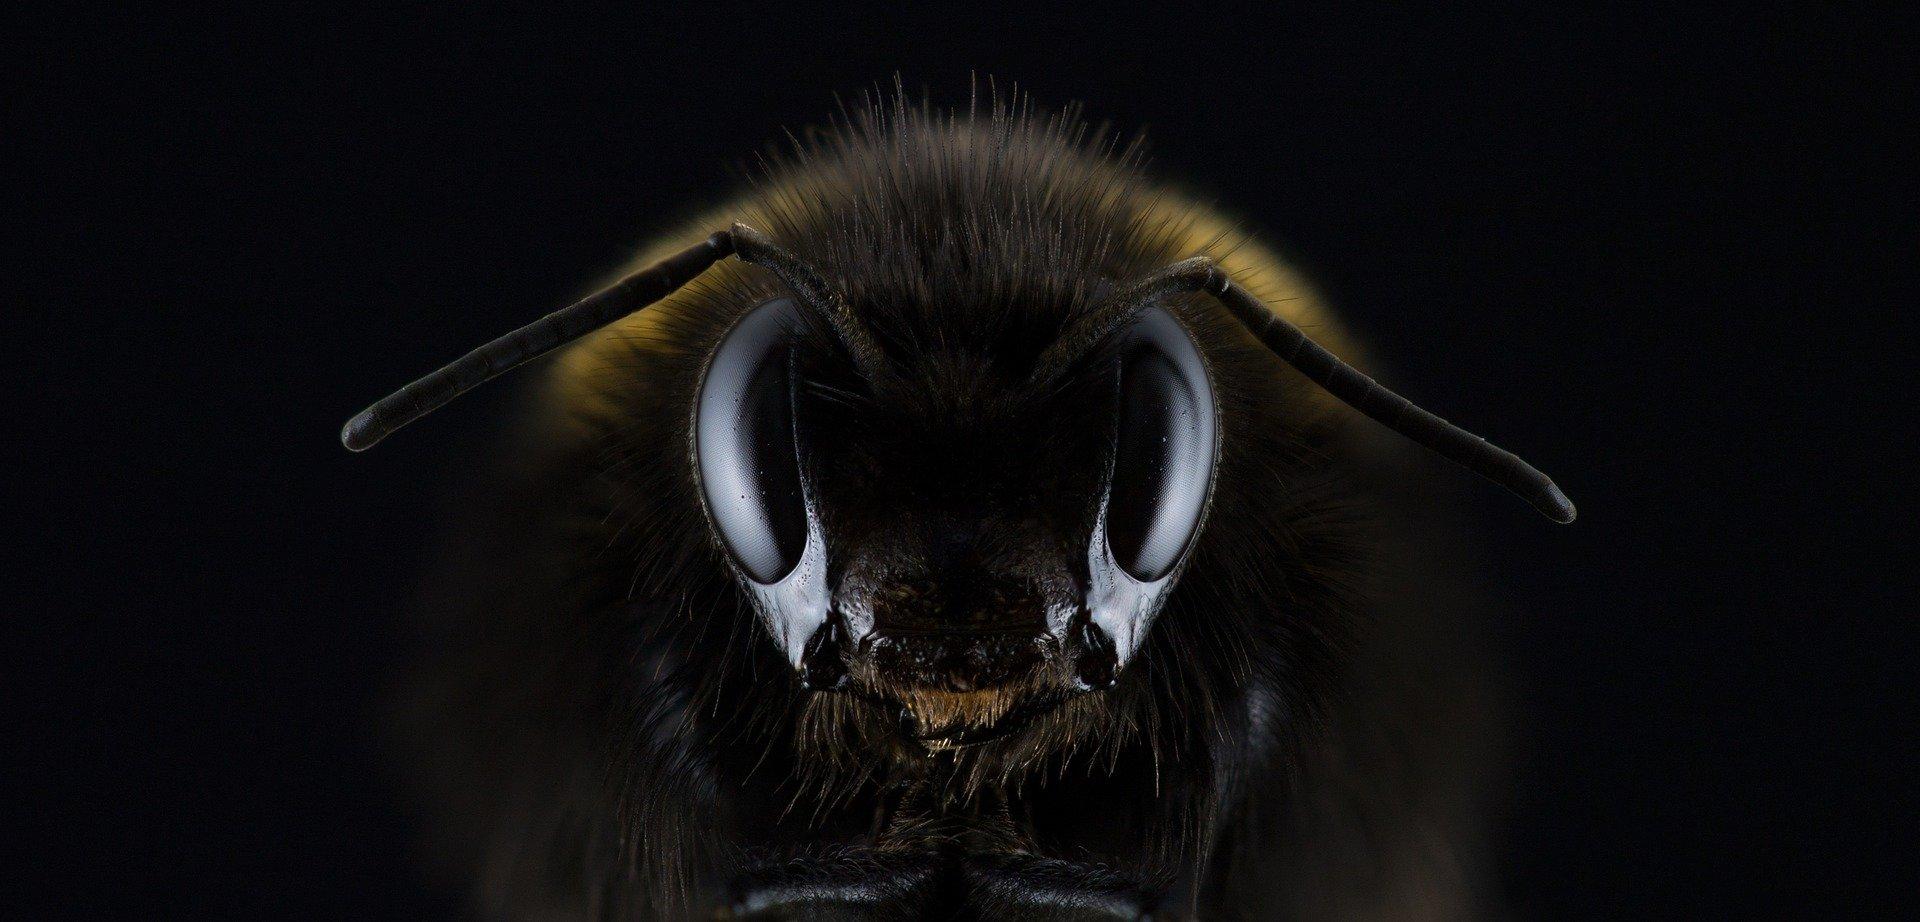 diable-noir-macro-photo